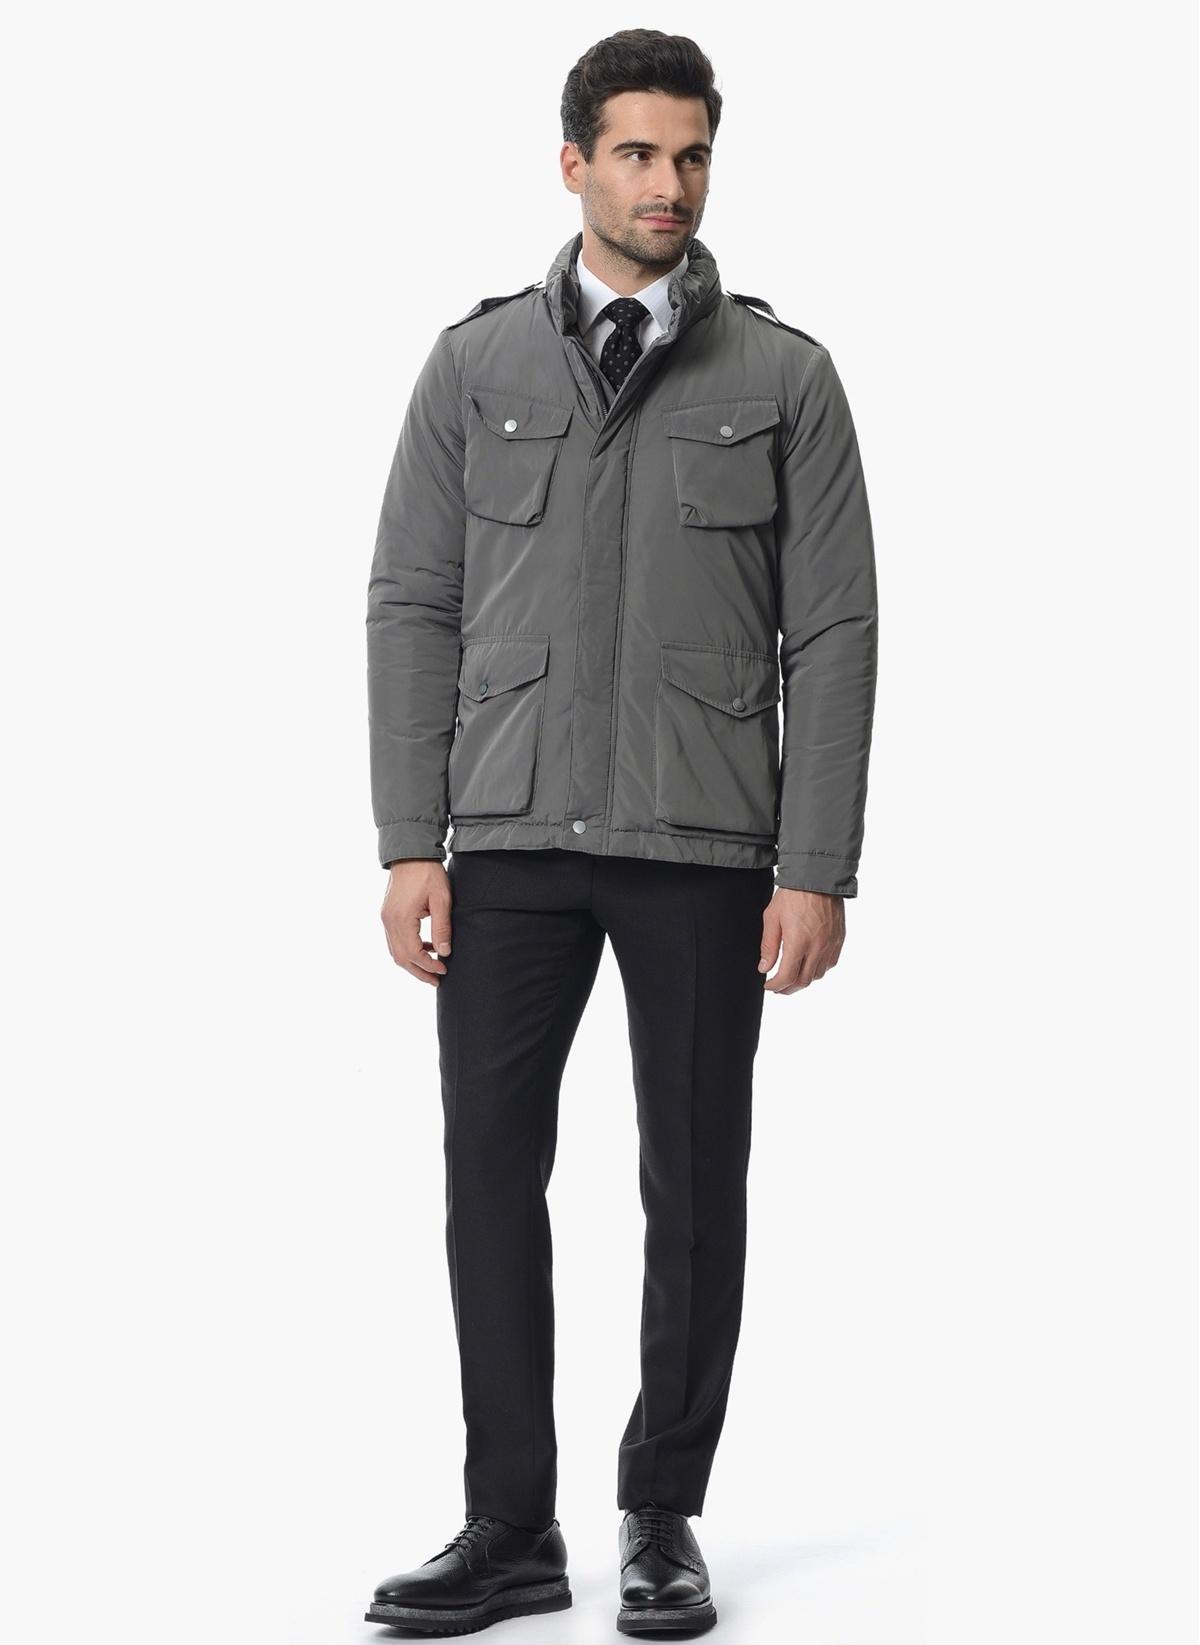 Network Slim Fit Mont 1057526-e-coat-ceket – 379.0 TL